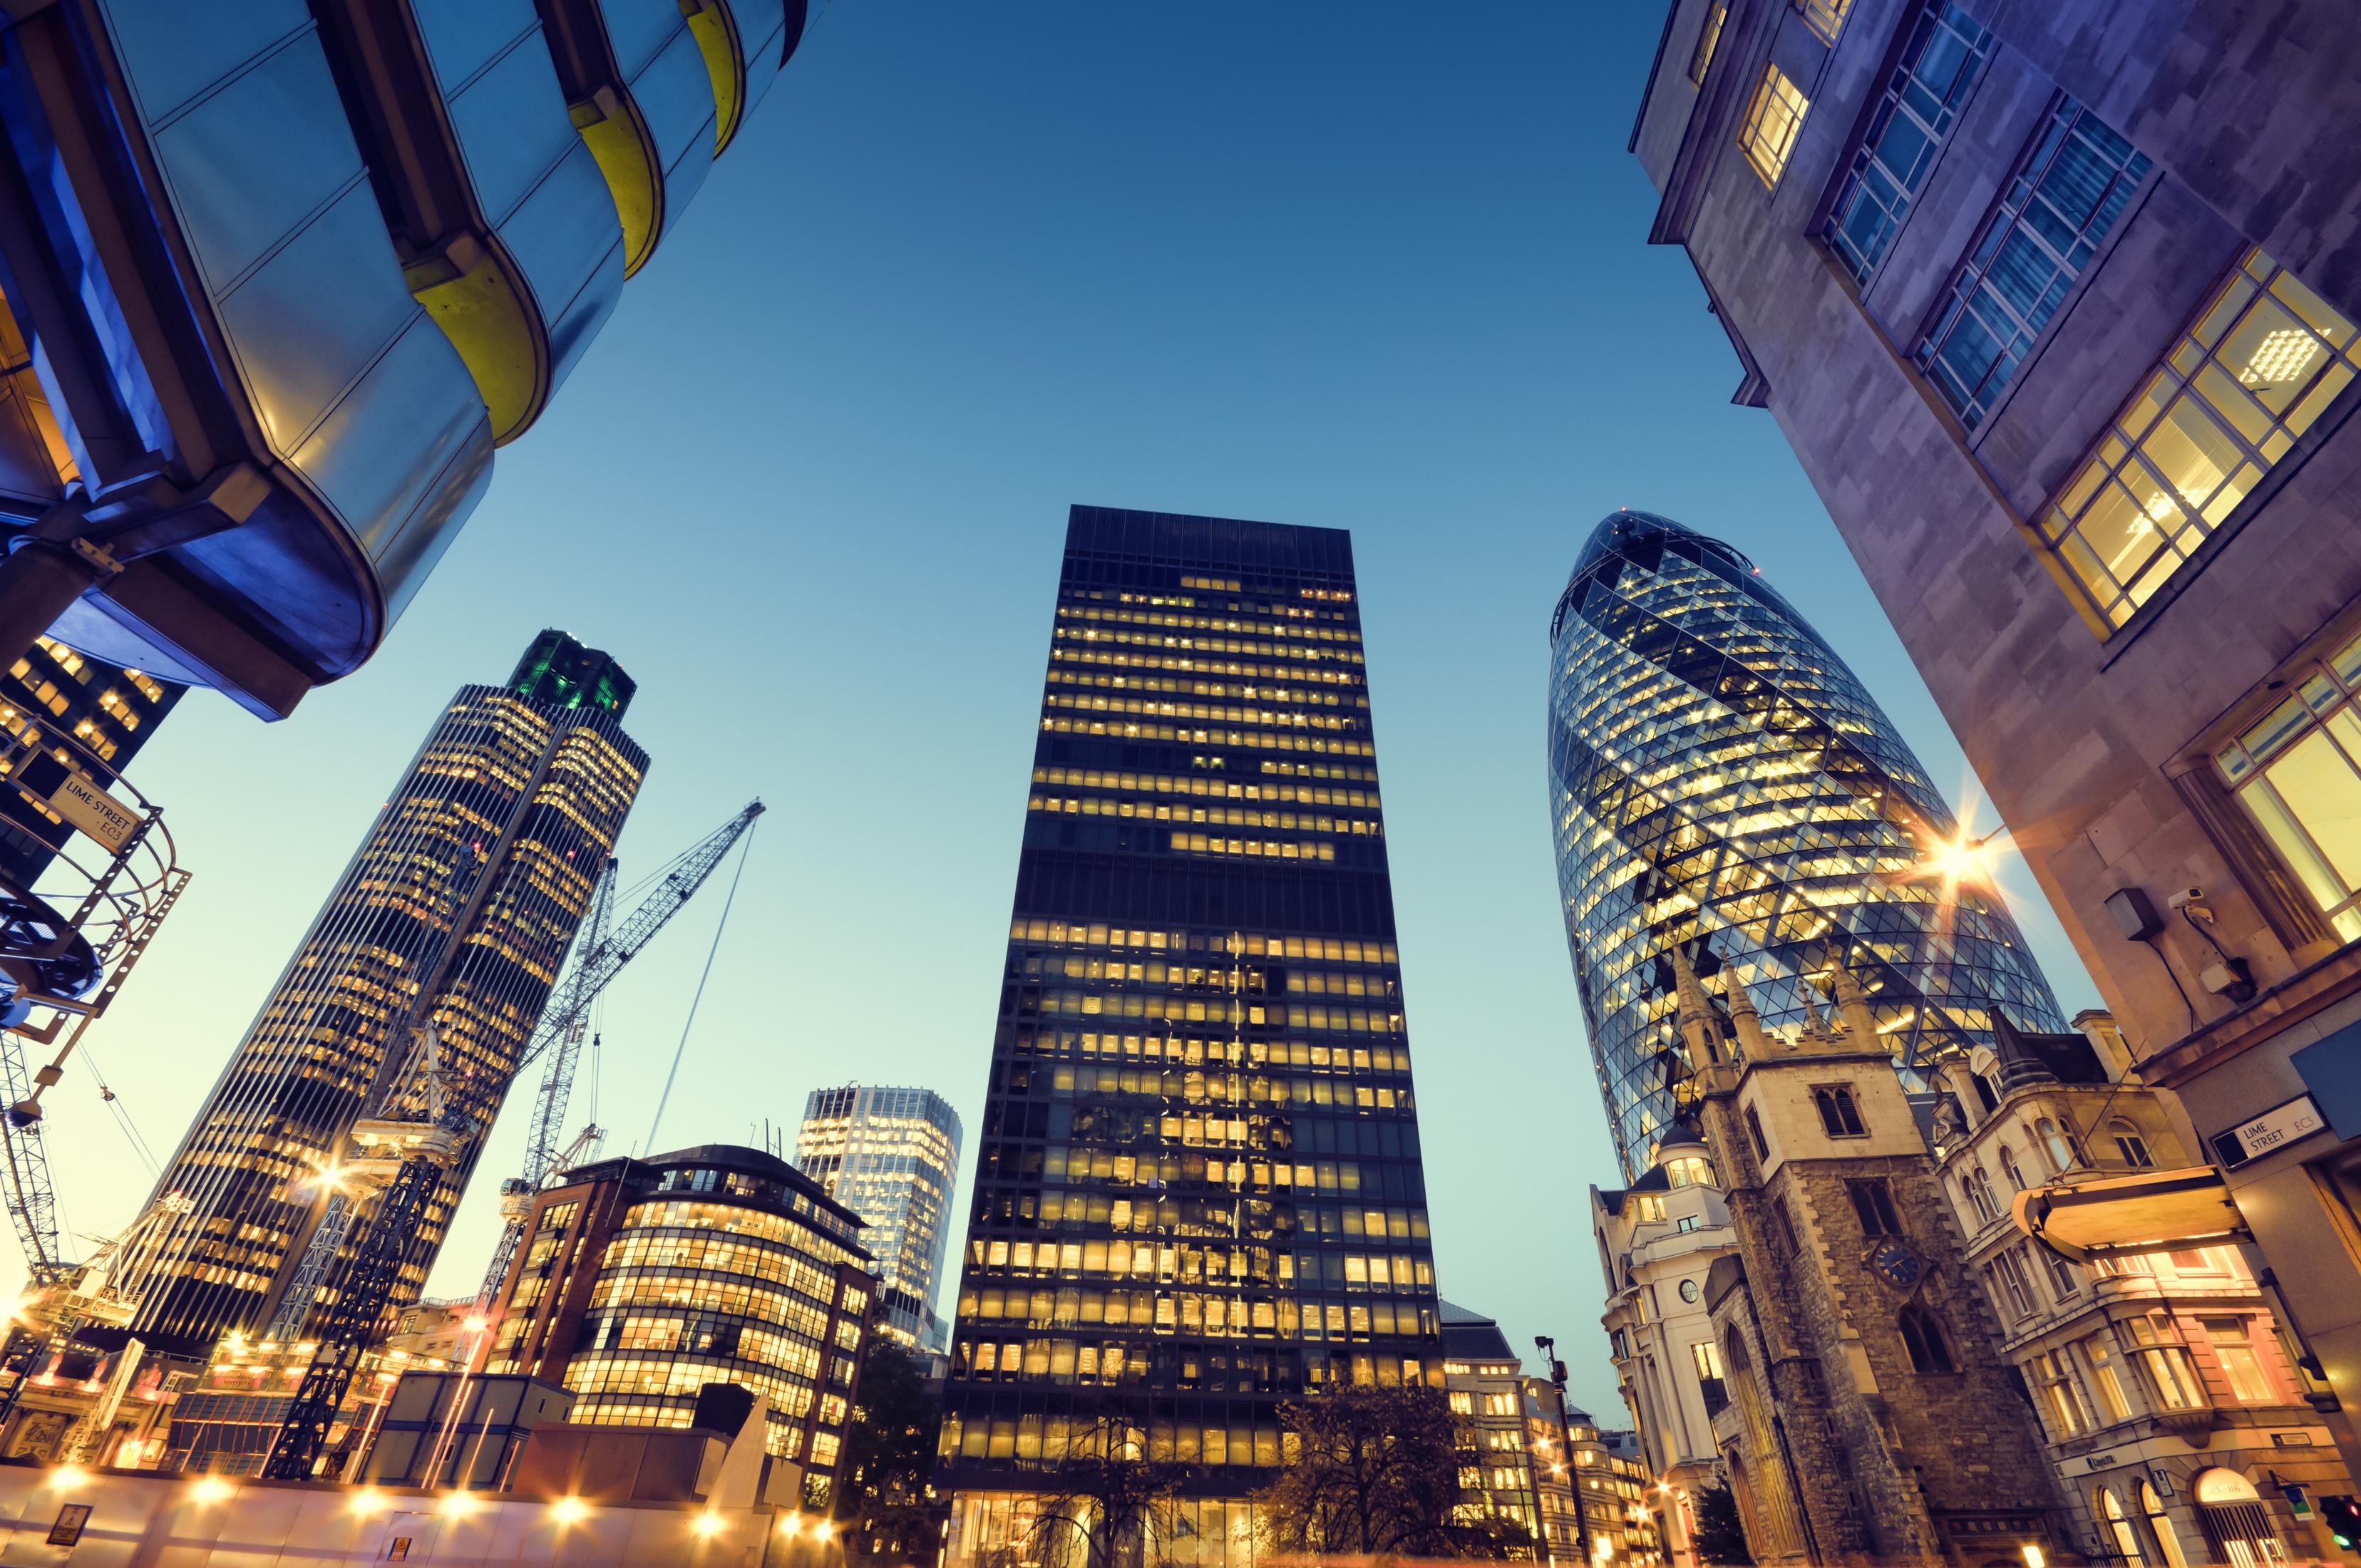 View of City of London sky scrapers